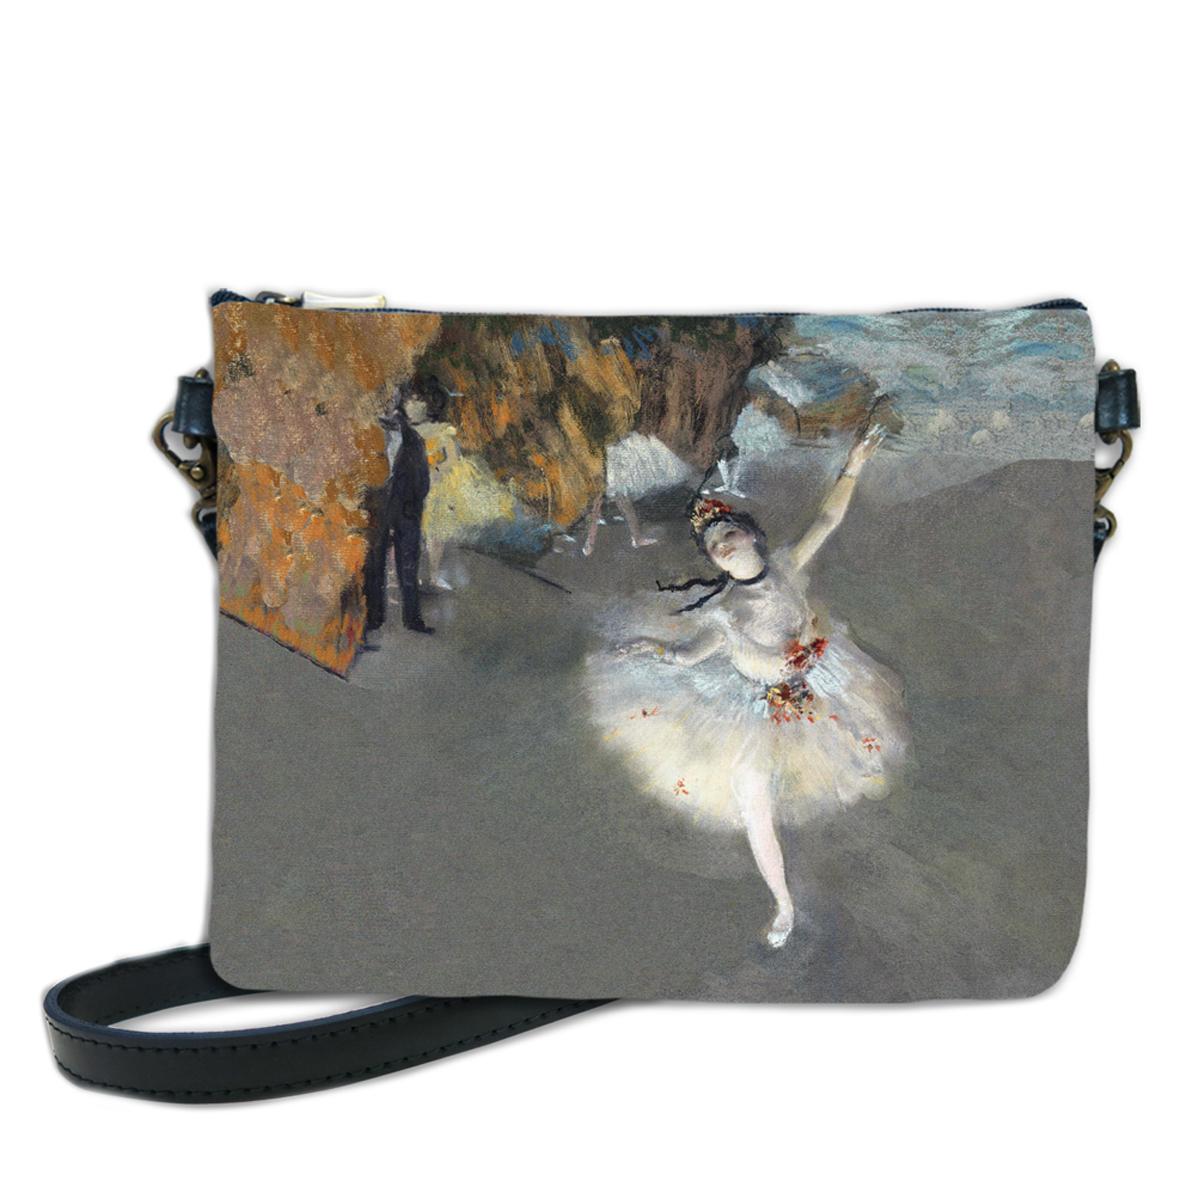 Sac bandoulière artisanal \'Edgar Degas\' (l\'Etoile)  - 24x18 cm - [Q6668]